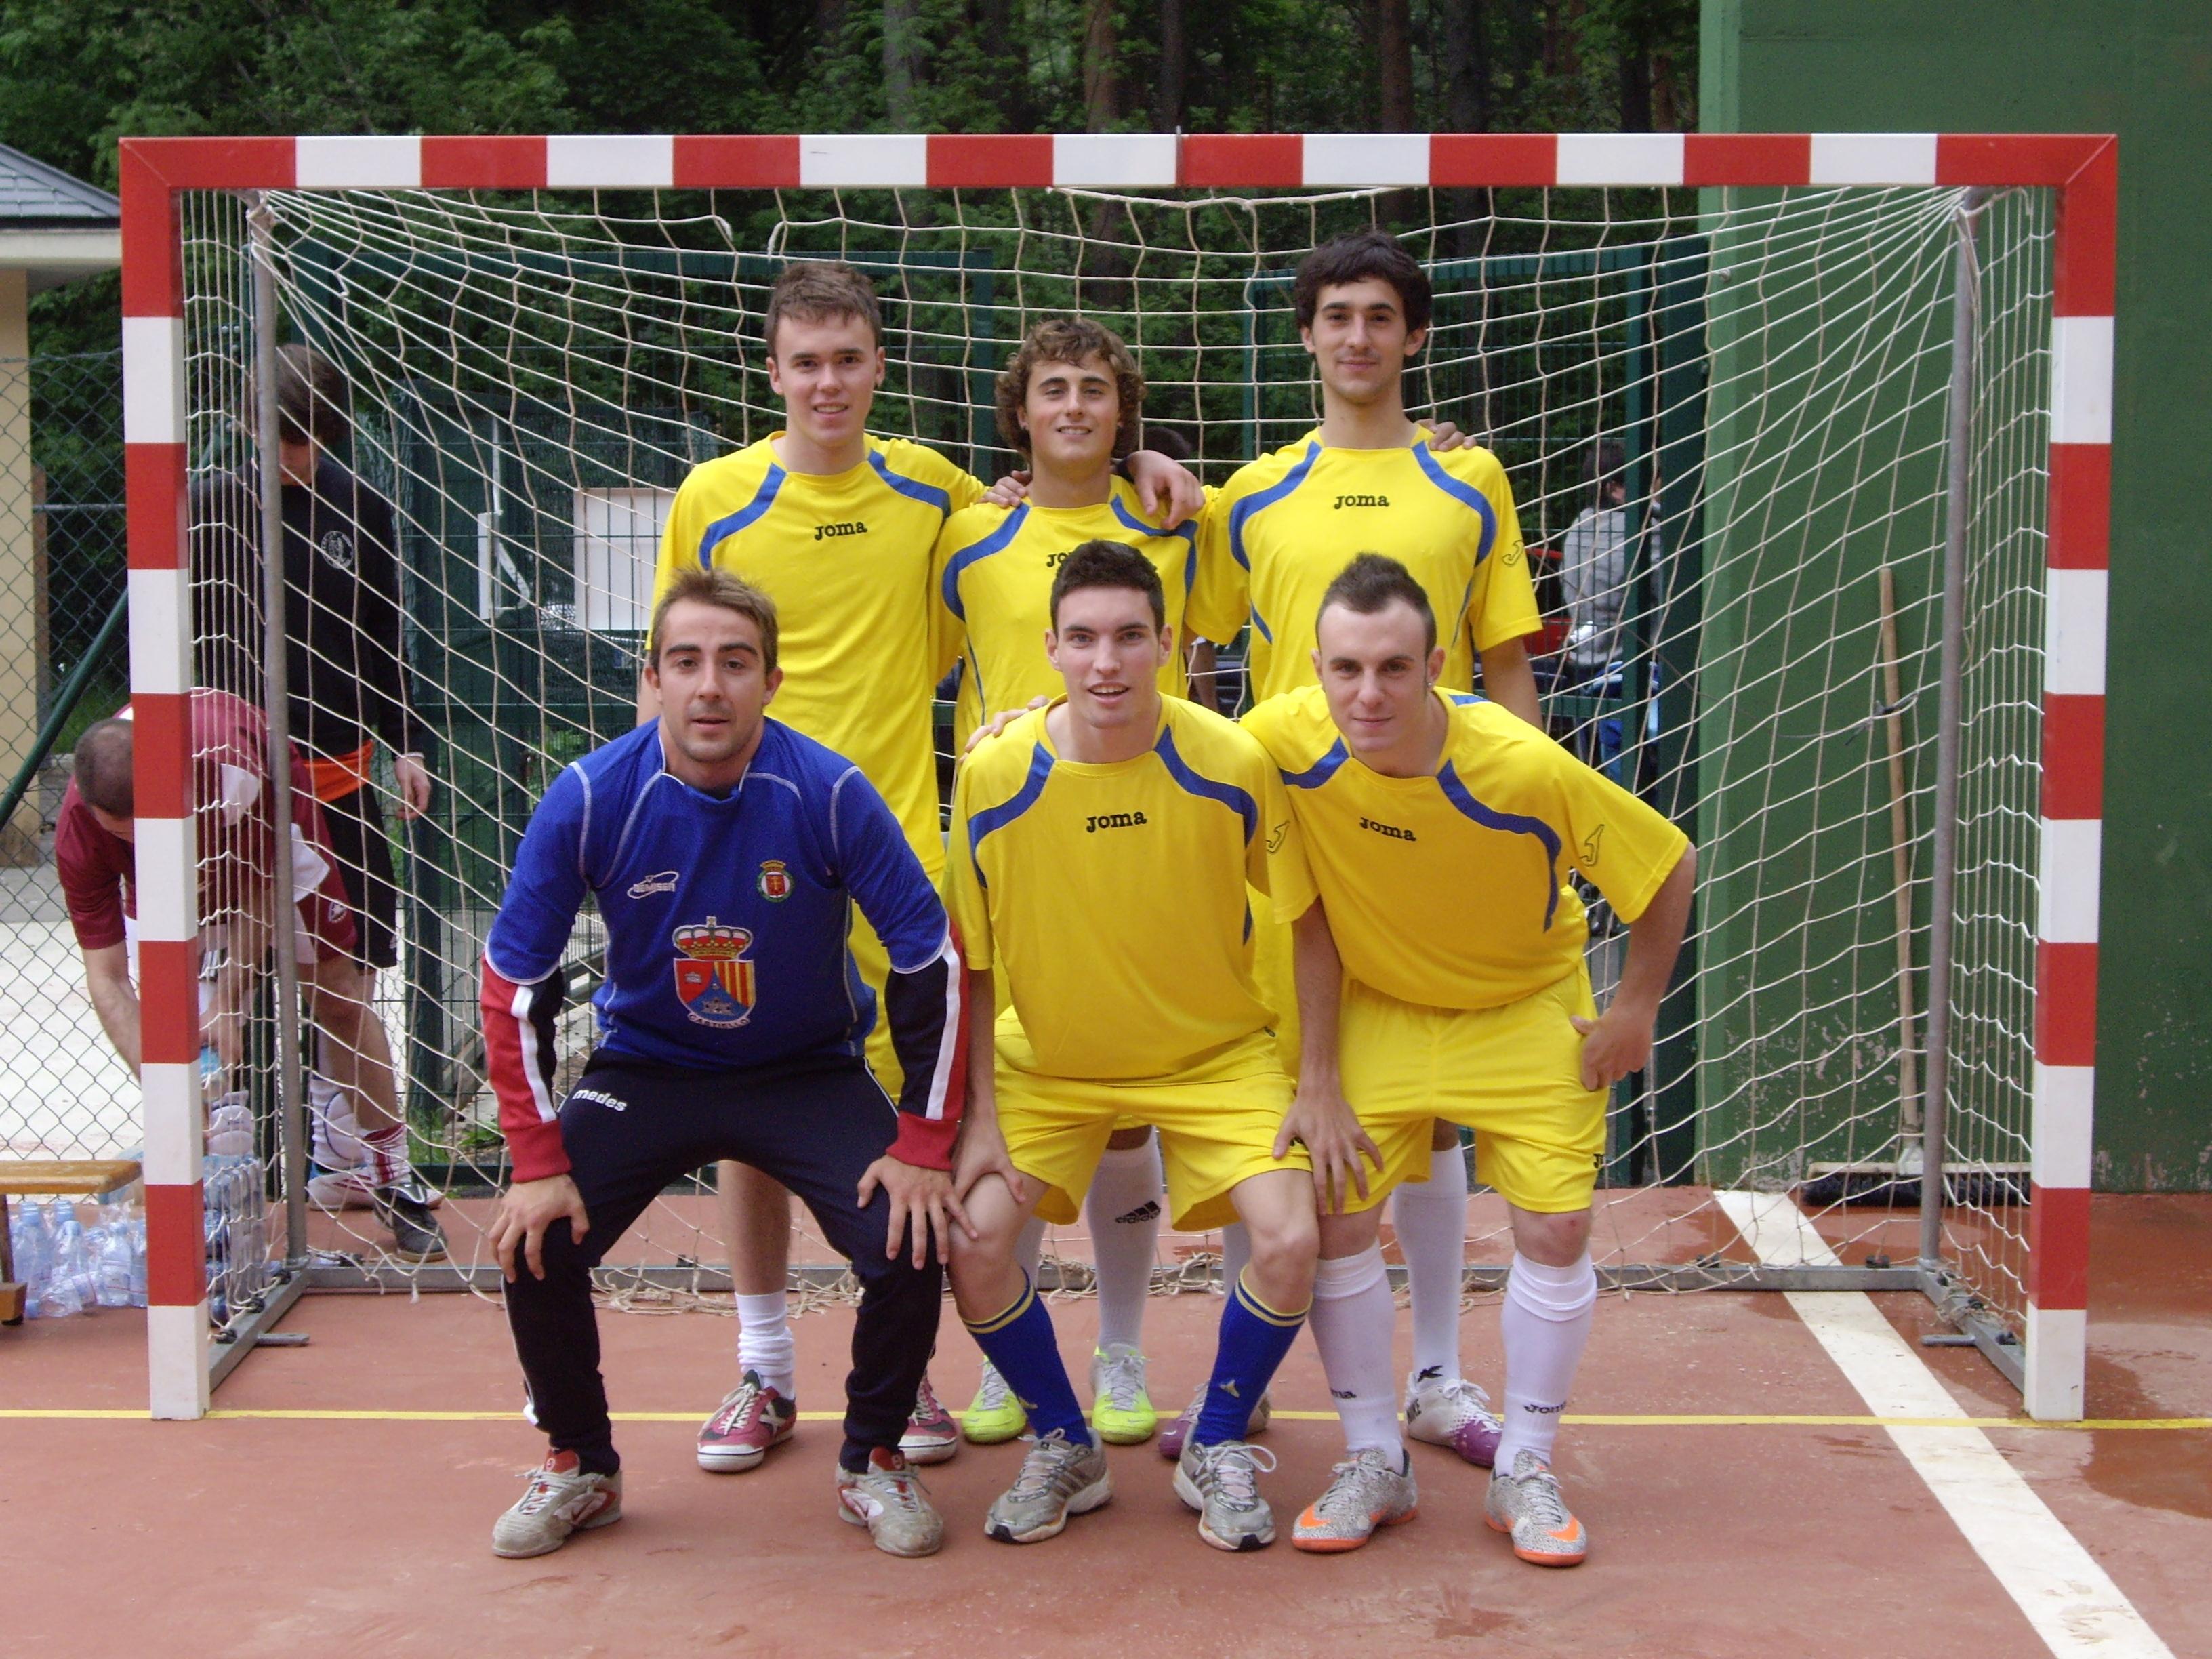 equipo futbol sala pzbt - pzbaldetena